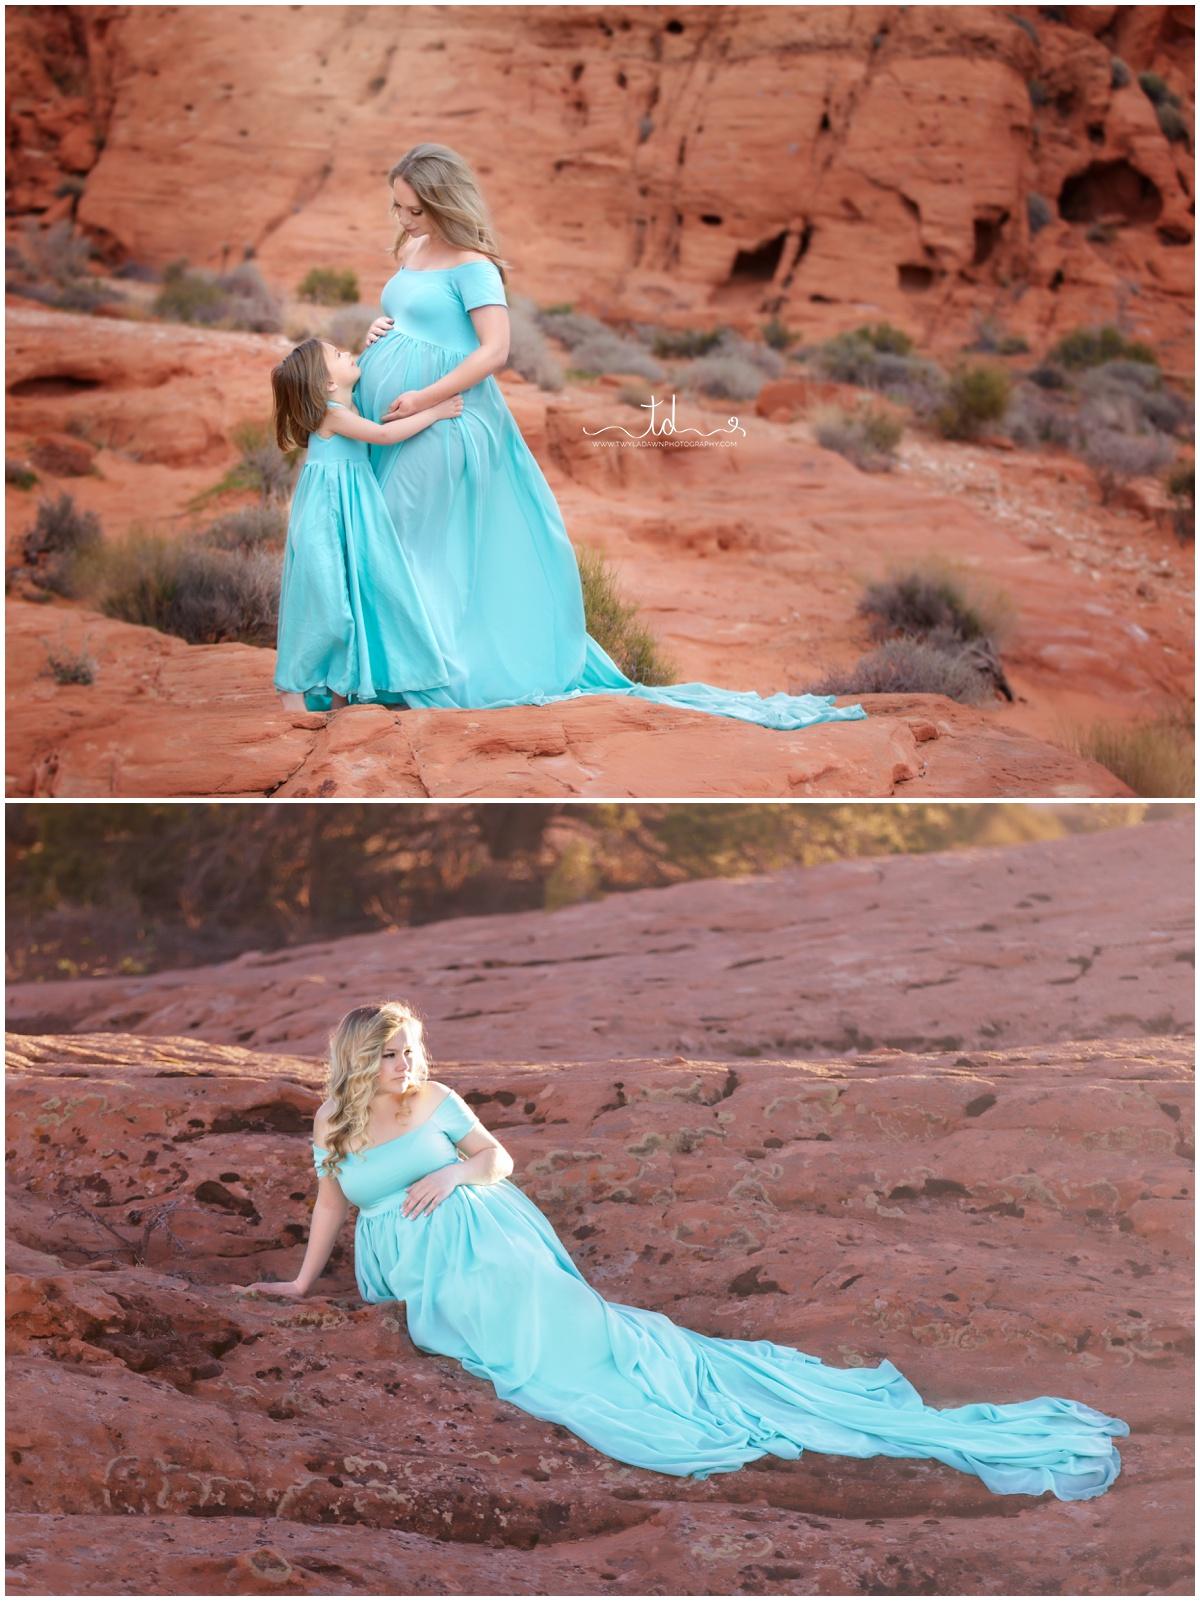 Tiffany Blue Cameron Maternity Gown | Utah Maternity Photographer | Twyla Dawn Photography